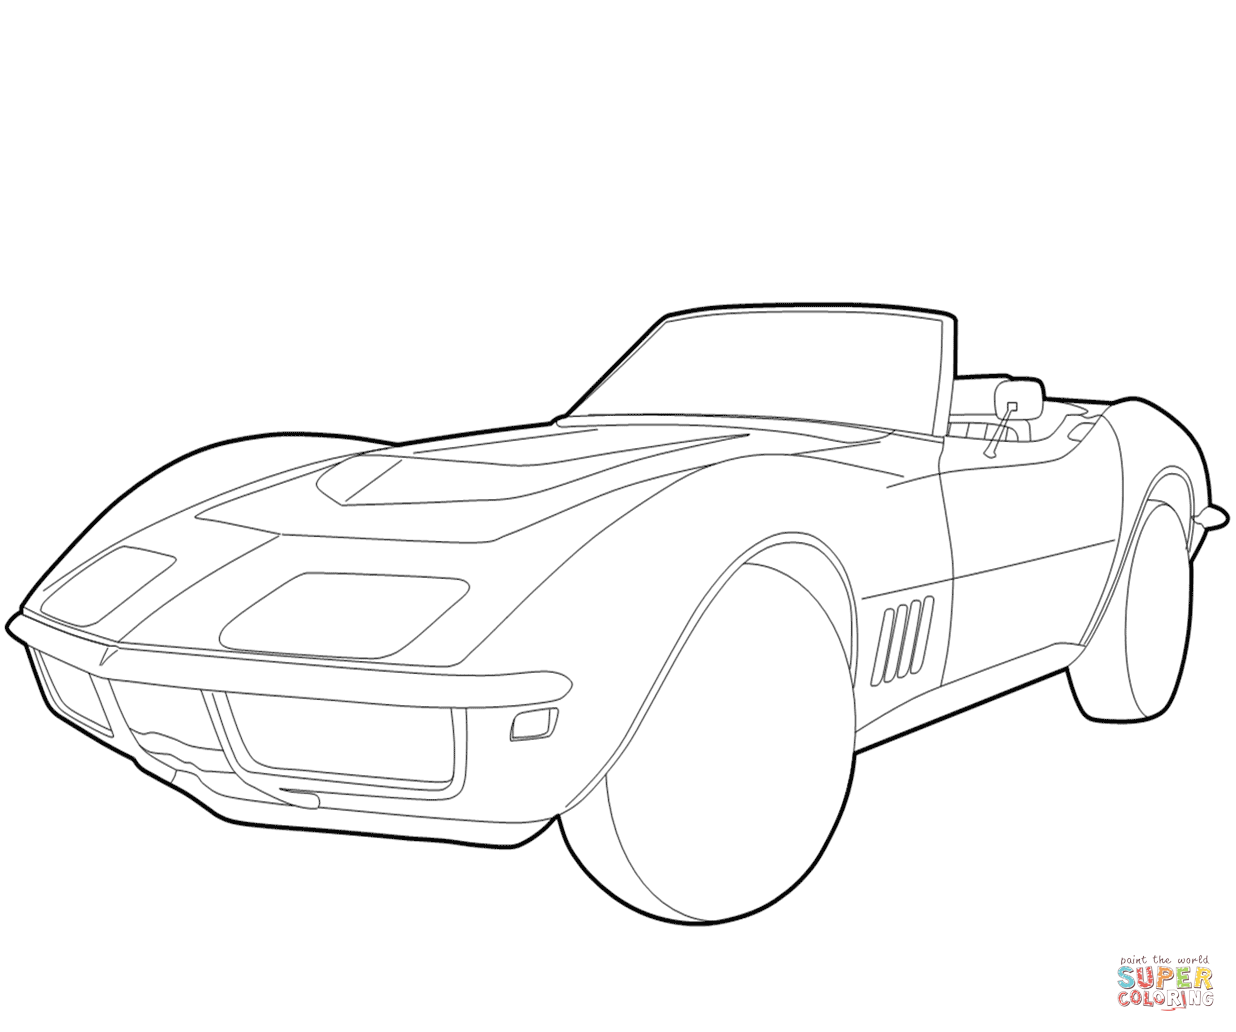 Camaro Drawing At Getdrawings